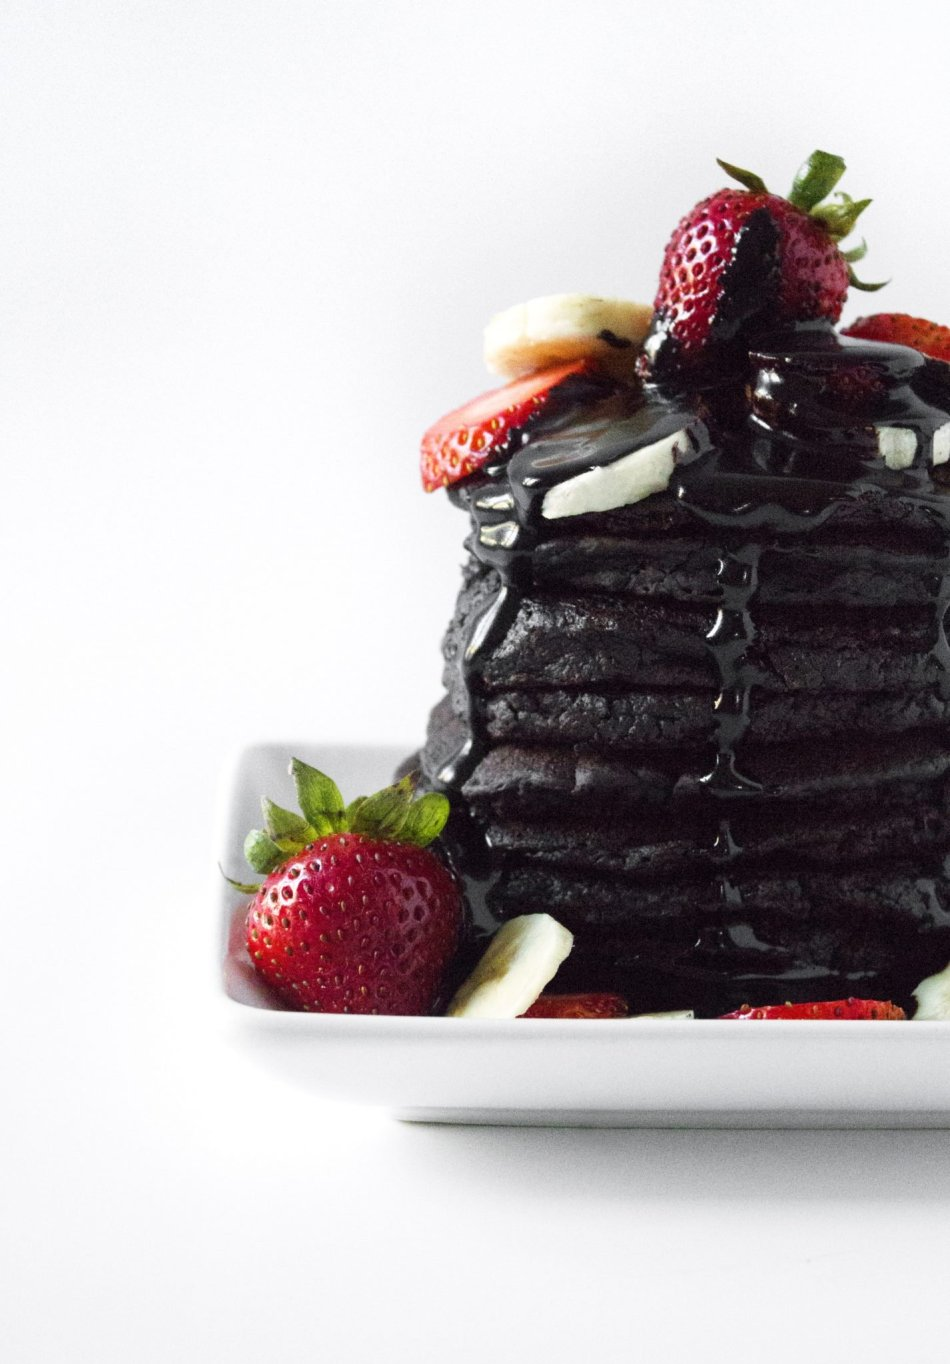 Chocolate Zucchini Pancakes With Sauce